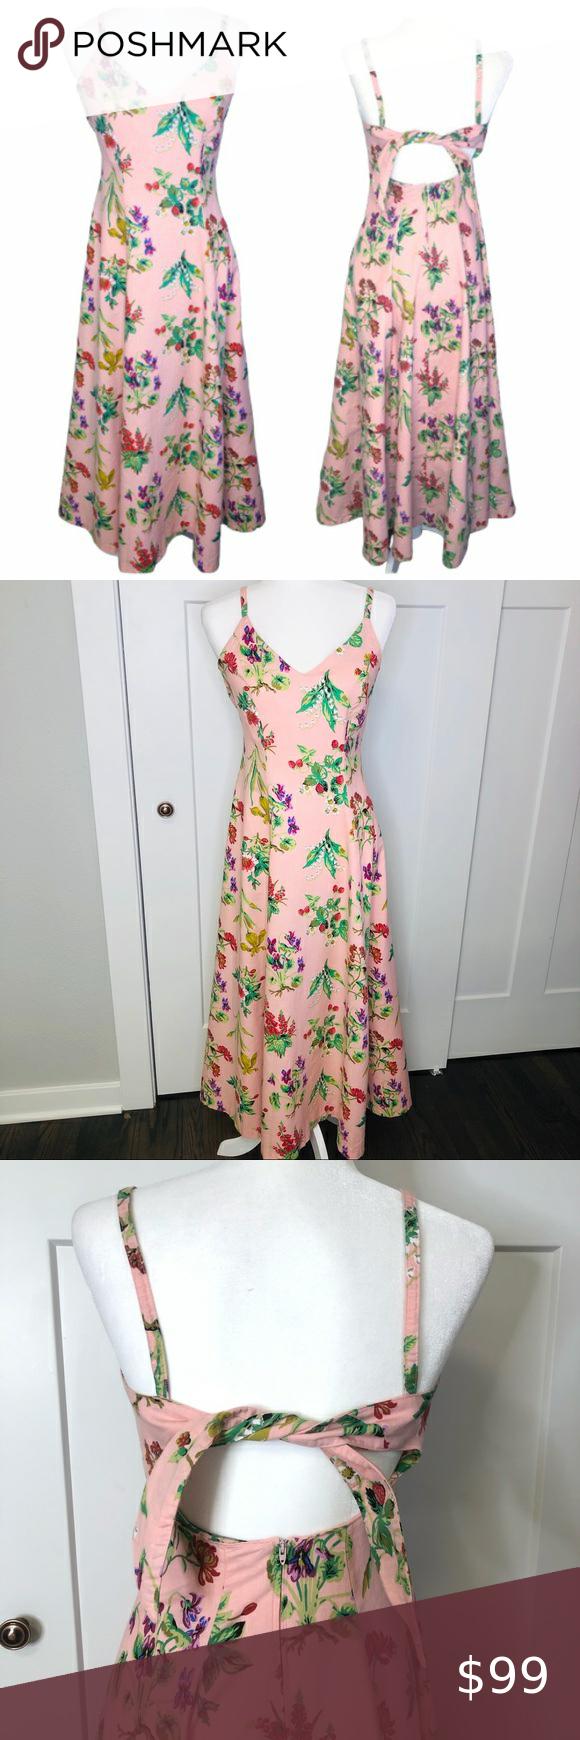 Betsey Johnson Vintage Pink Floral Maxi Dress Women S Vintage Betsey Johnson Cotton Pink Fl Pink Floral Maxi Dress Betsey Johnson Dresses Womens Maxi Dresses [ 1740 x 580 Pixel ]